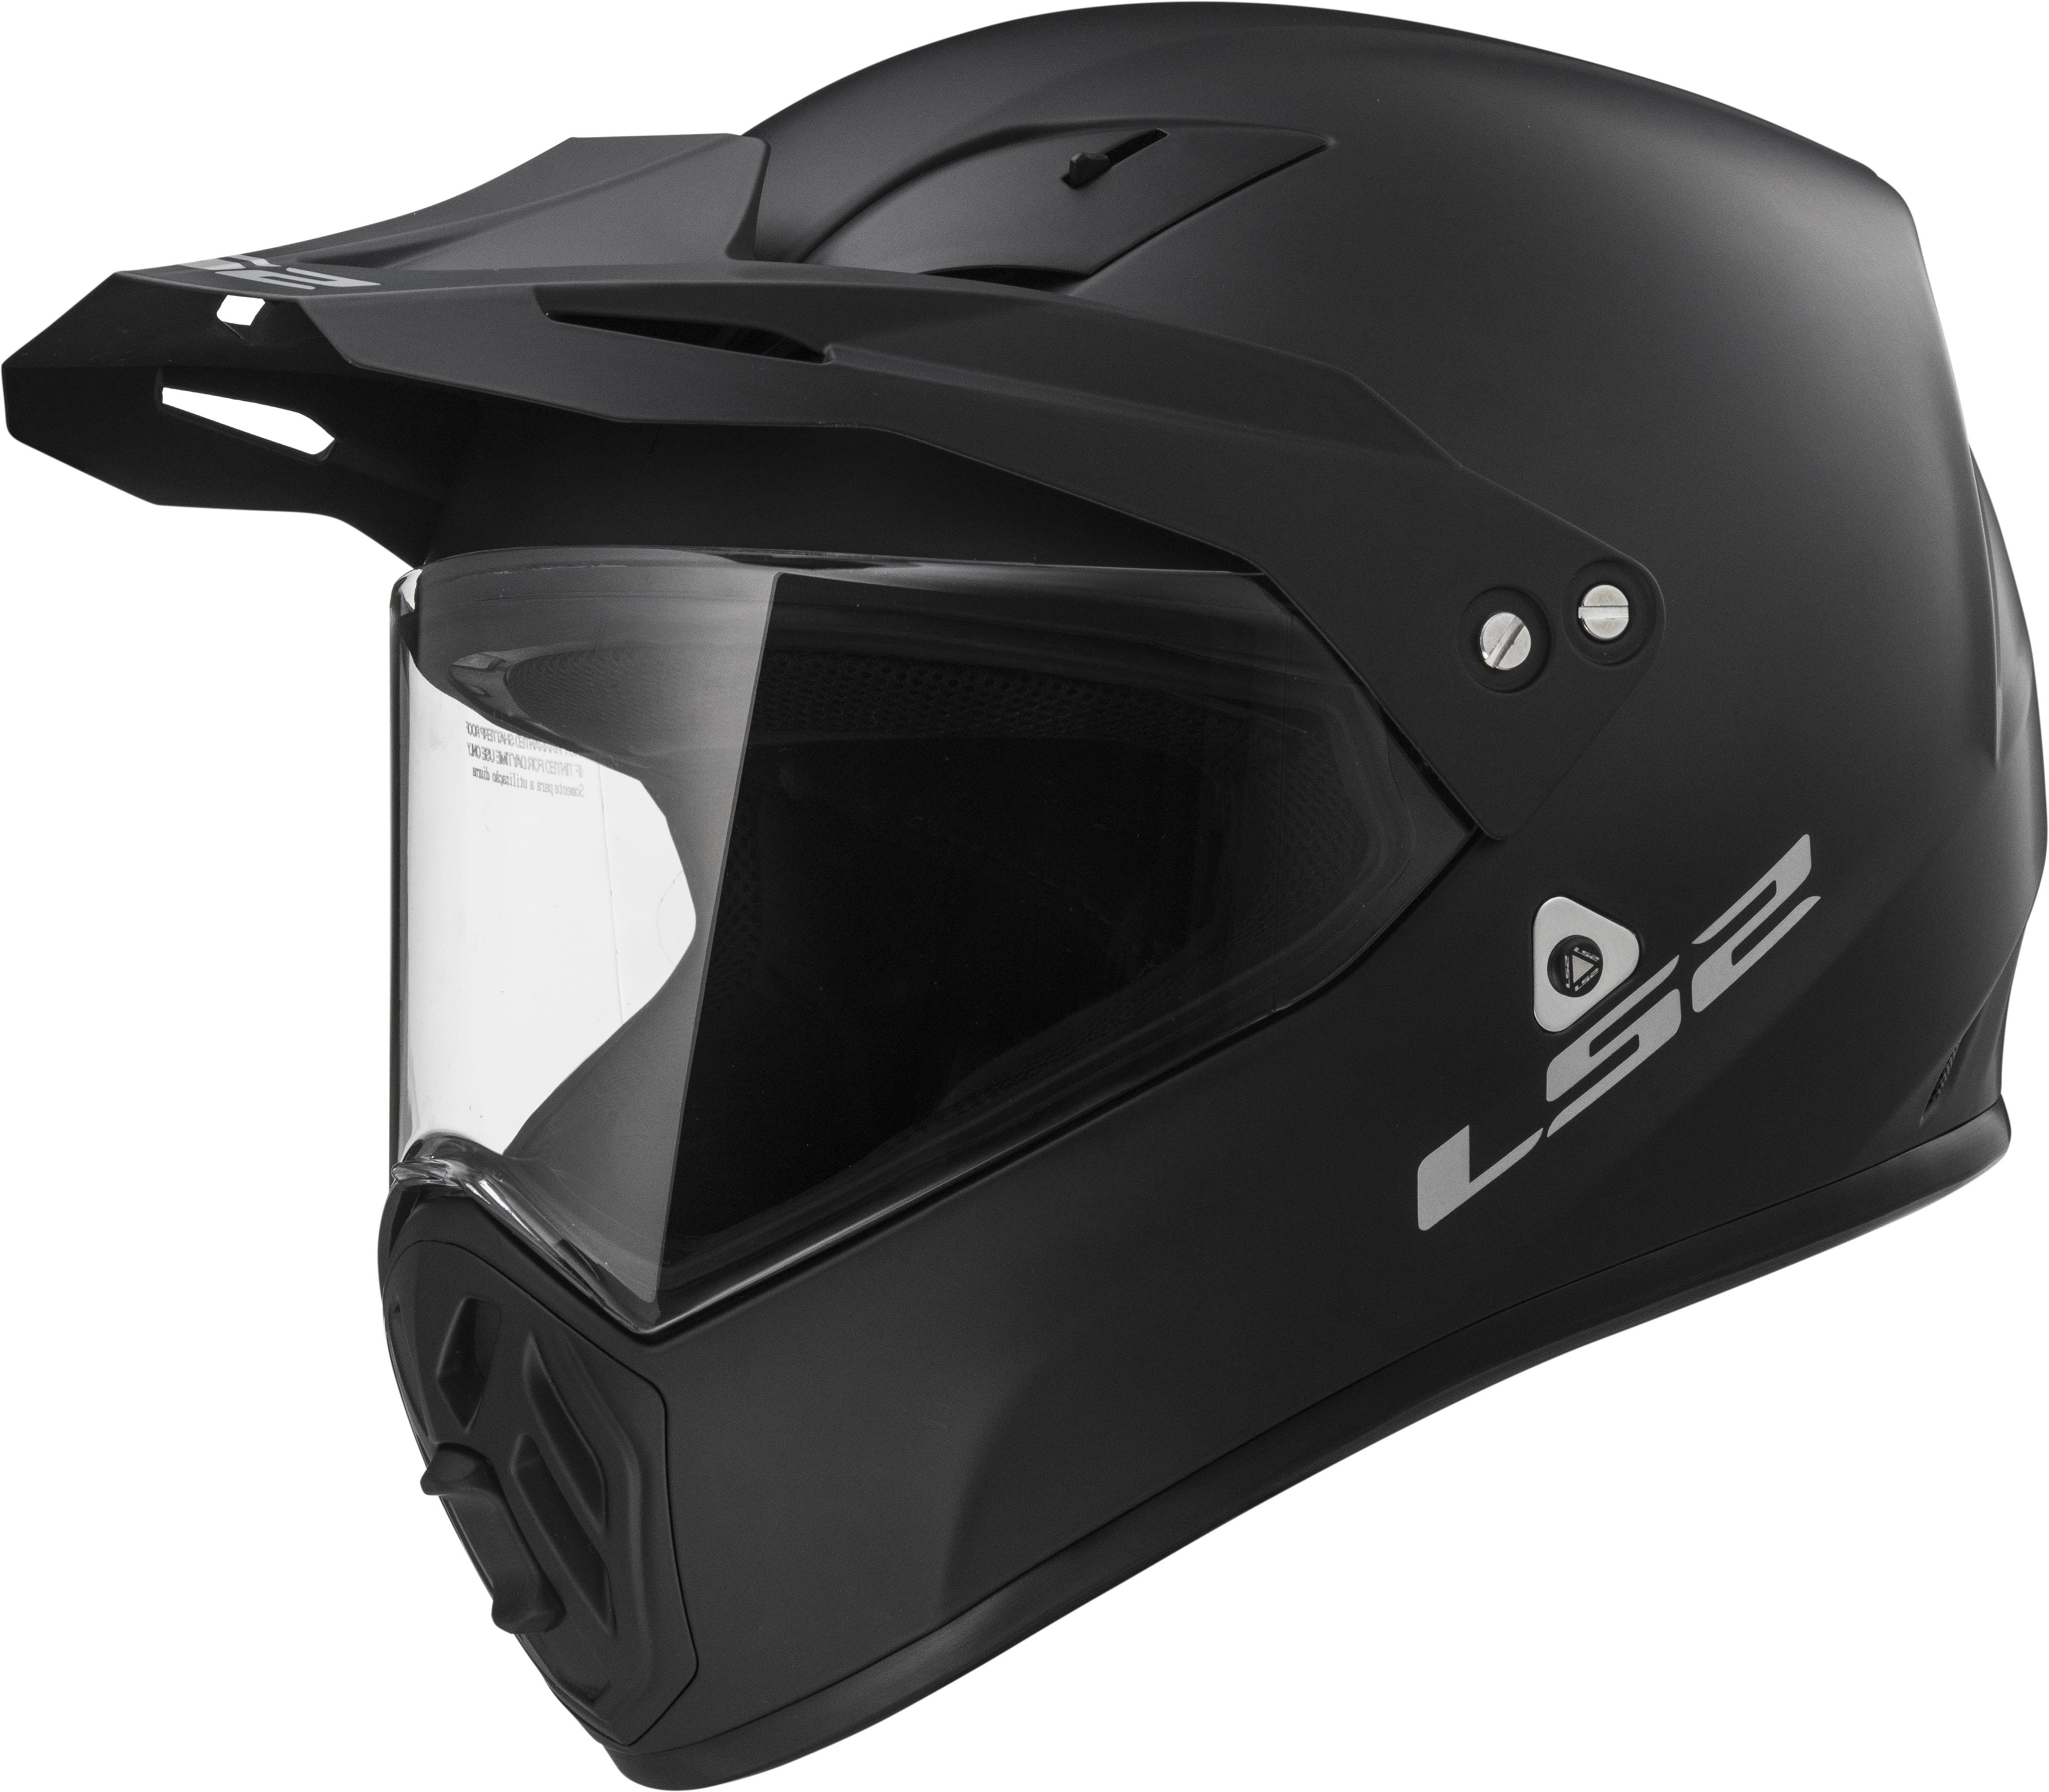 OHM Solid Helmet